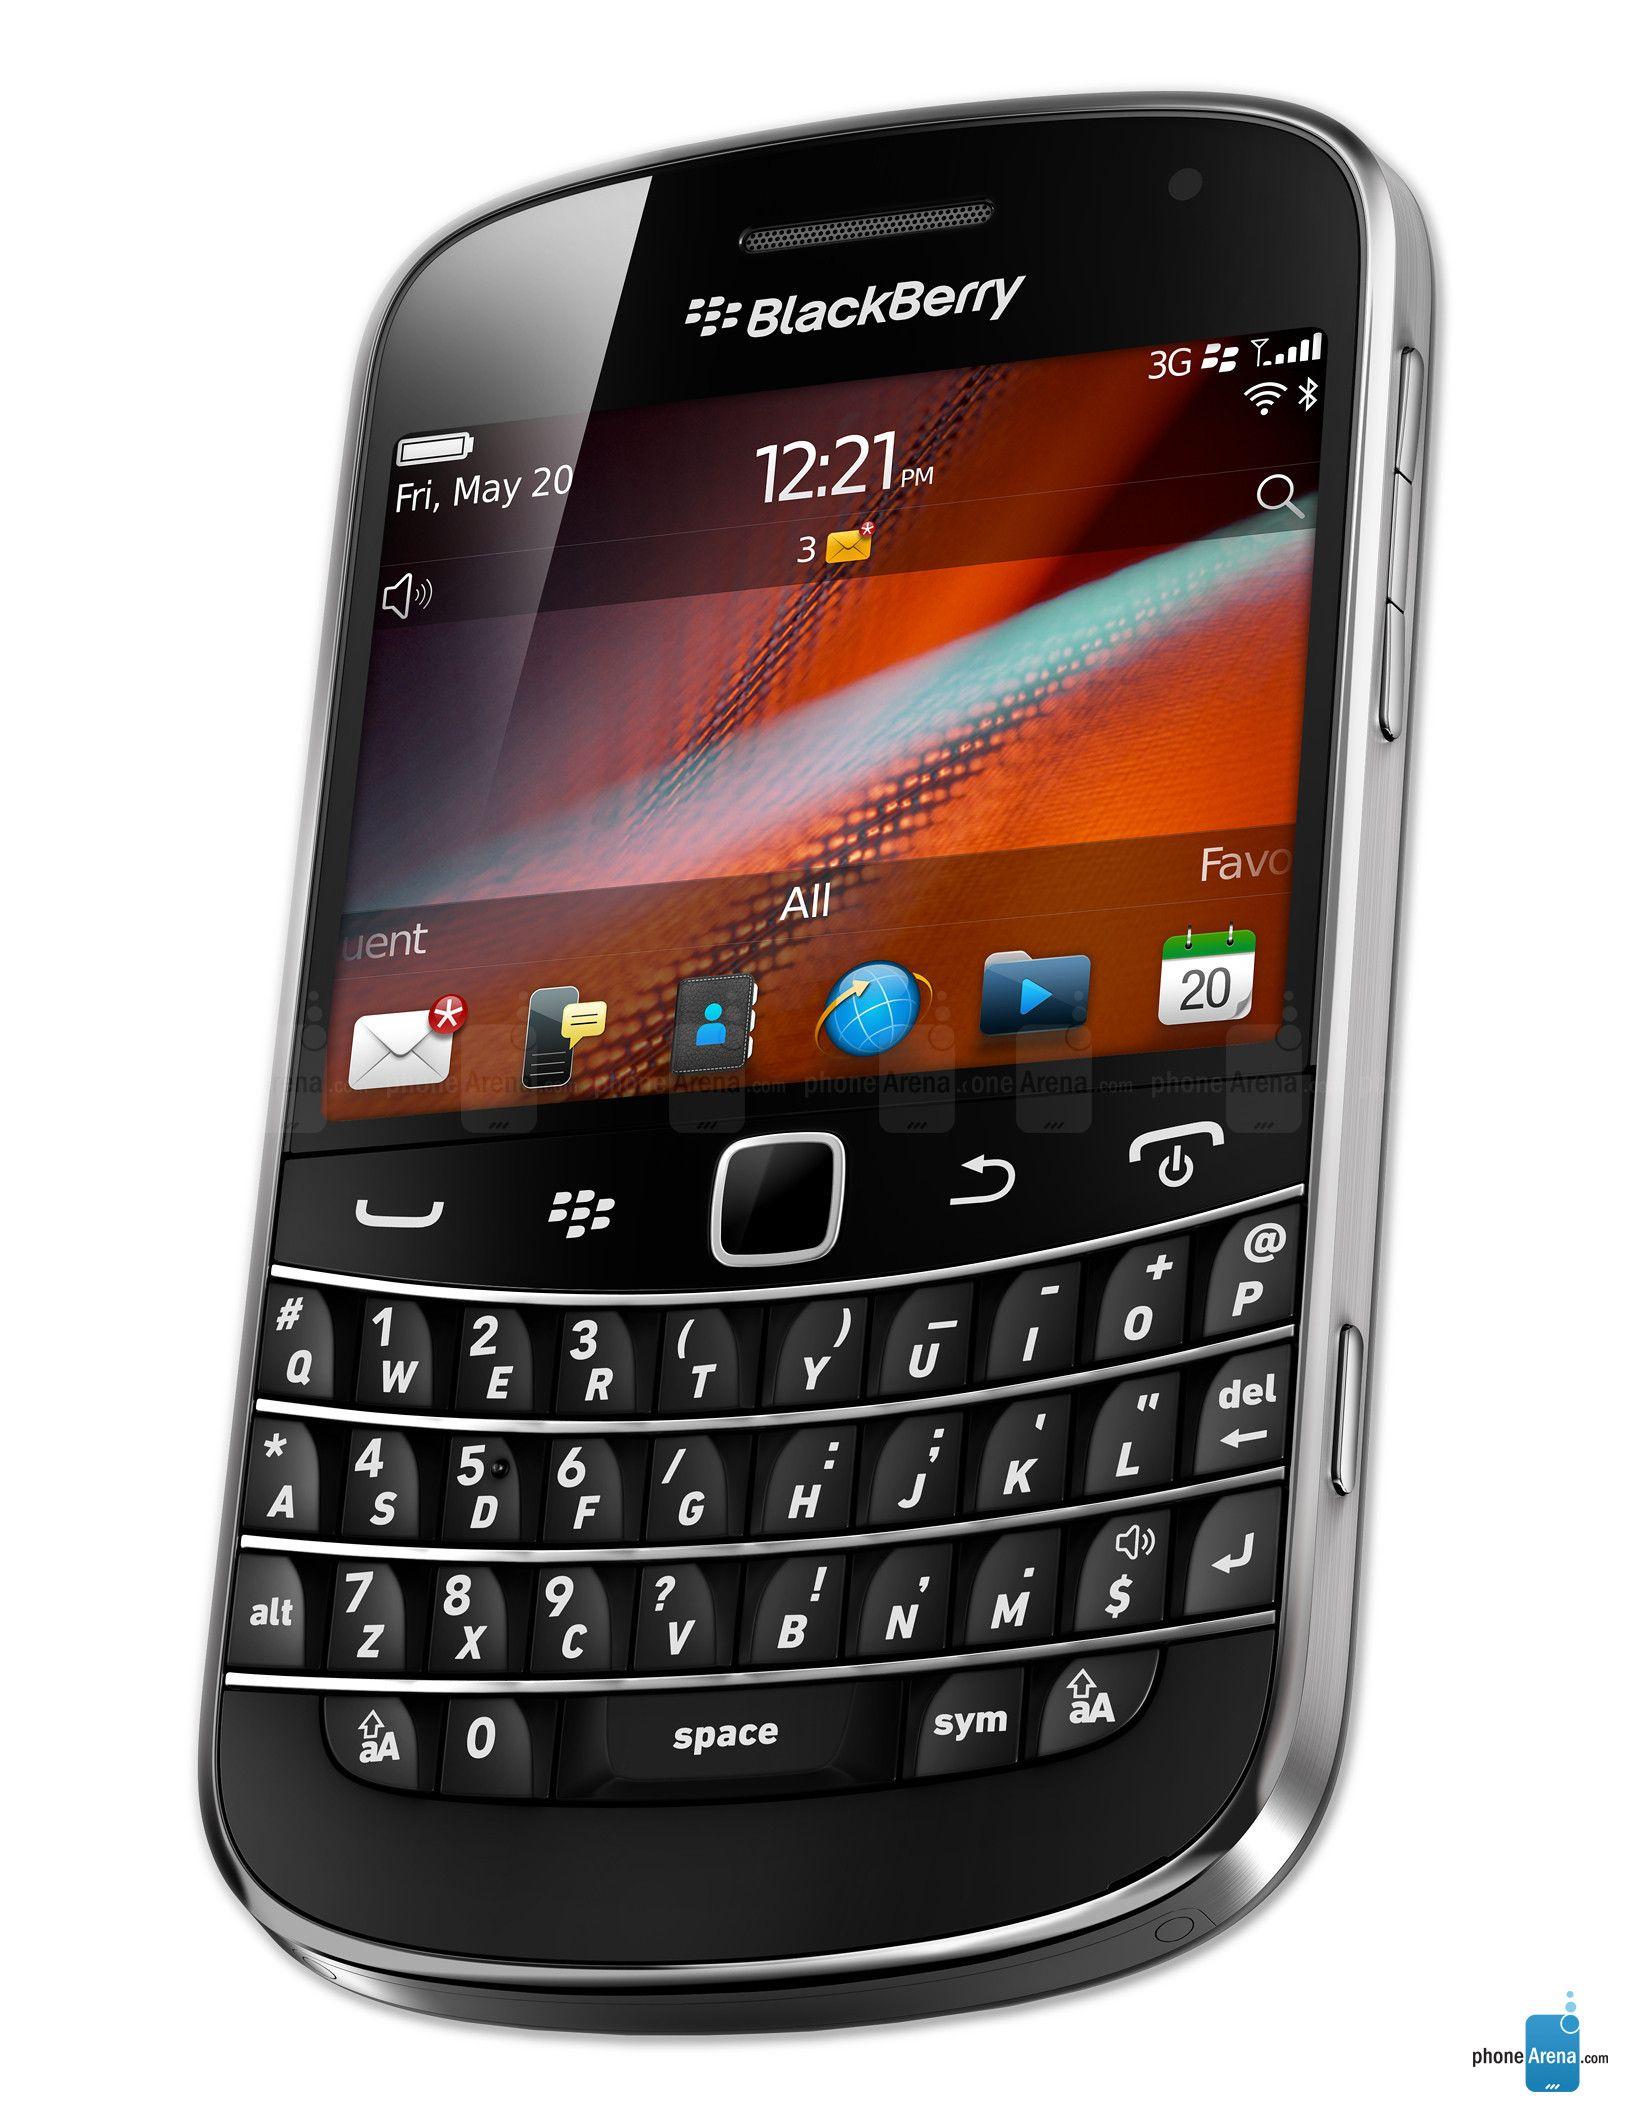 BlackBerry Bold 9900 specs